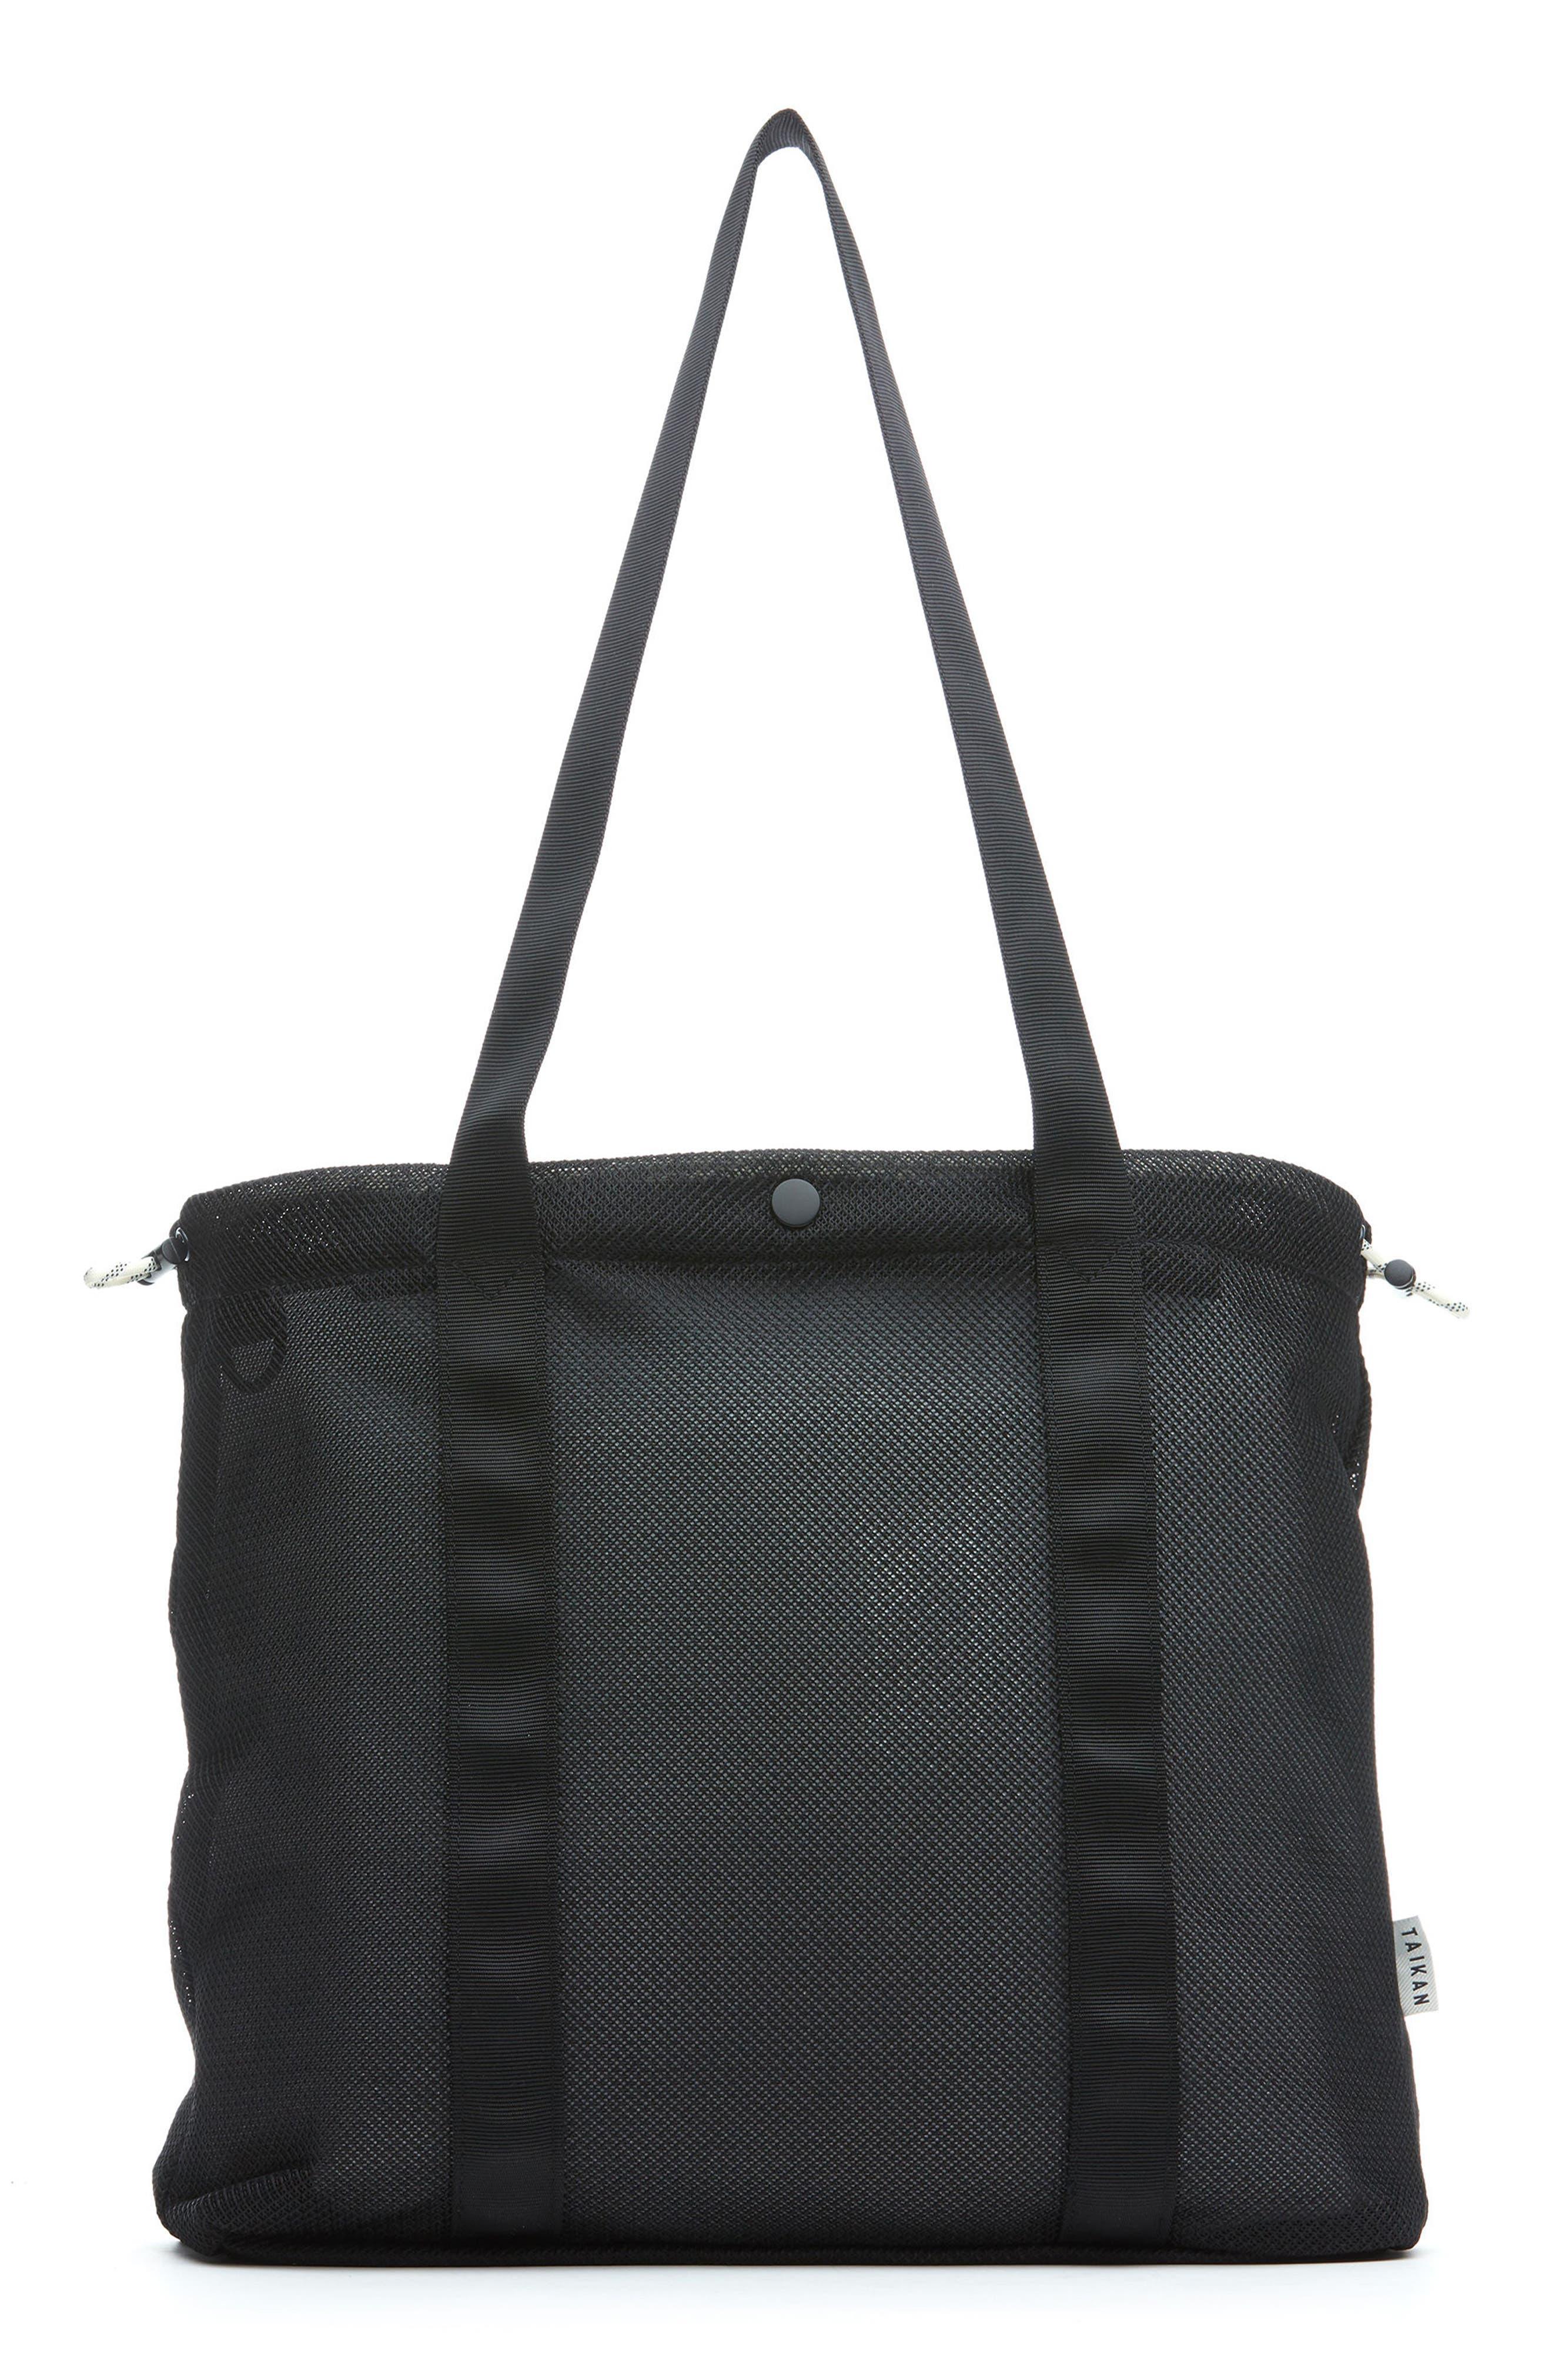 Flanker Mesh Tote Bag,                             Main thumbnail 1, color,                             Black Mesh